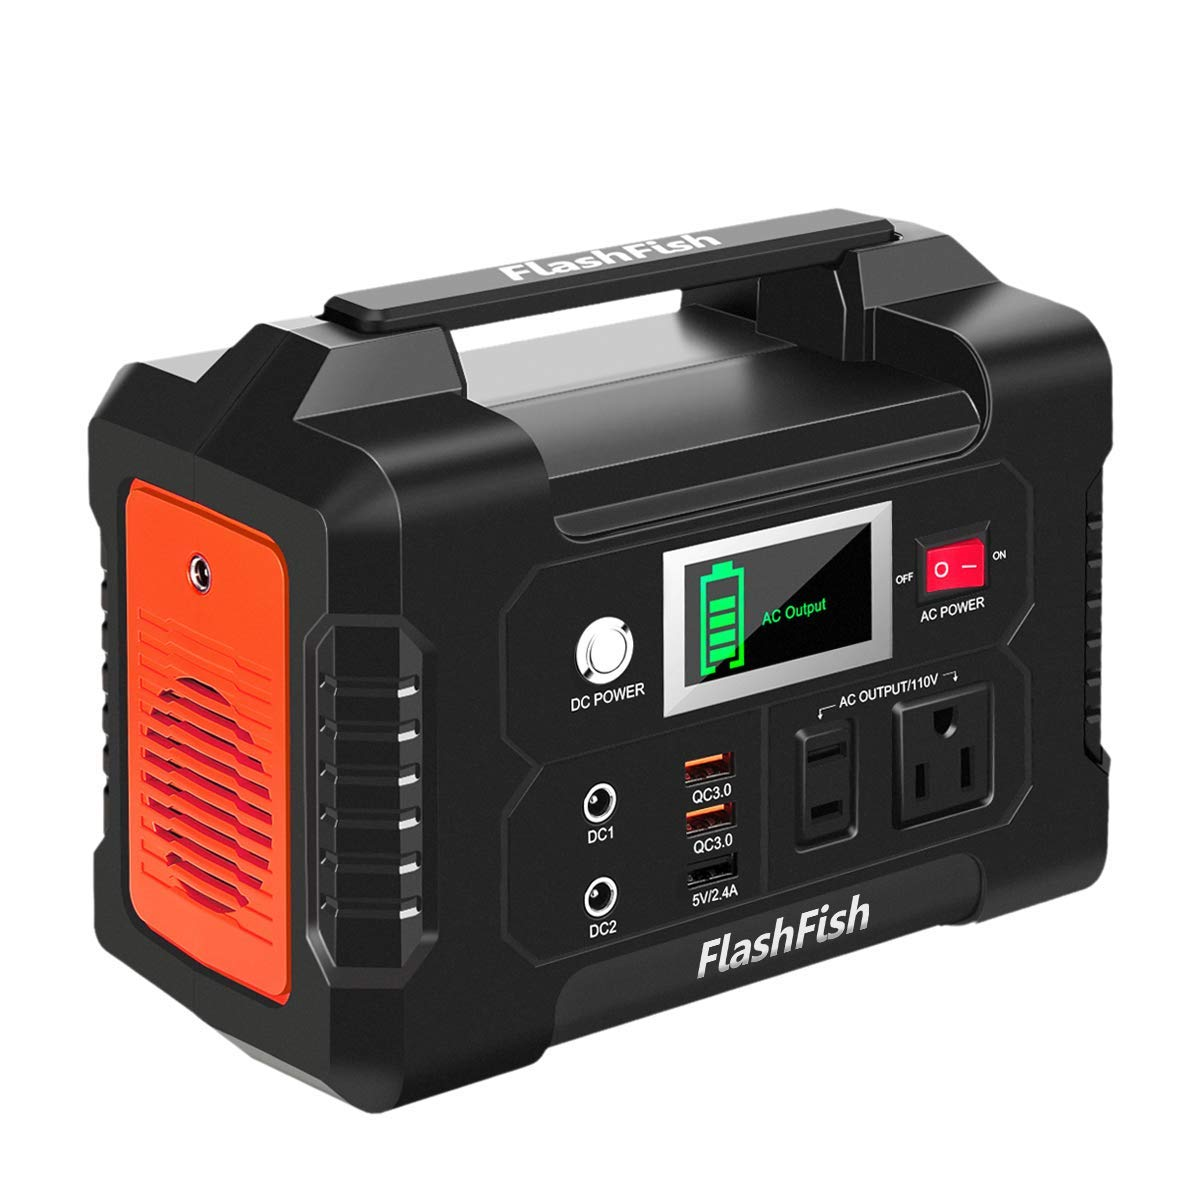 Portable FlashFish Generator Adventure Emergency